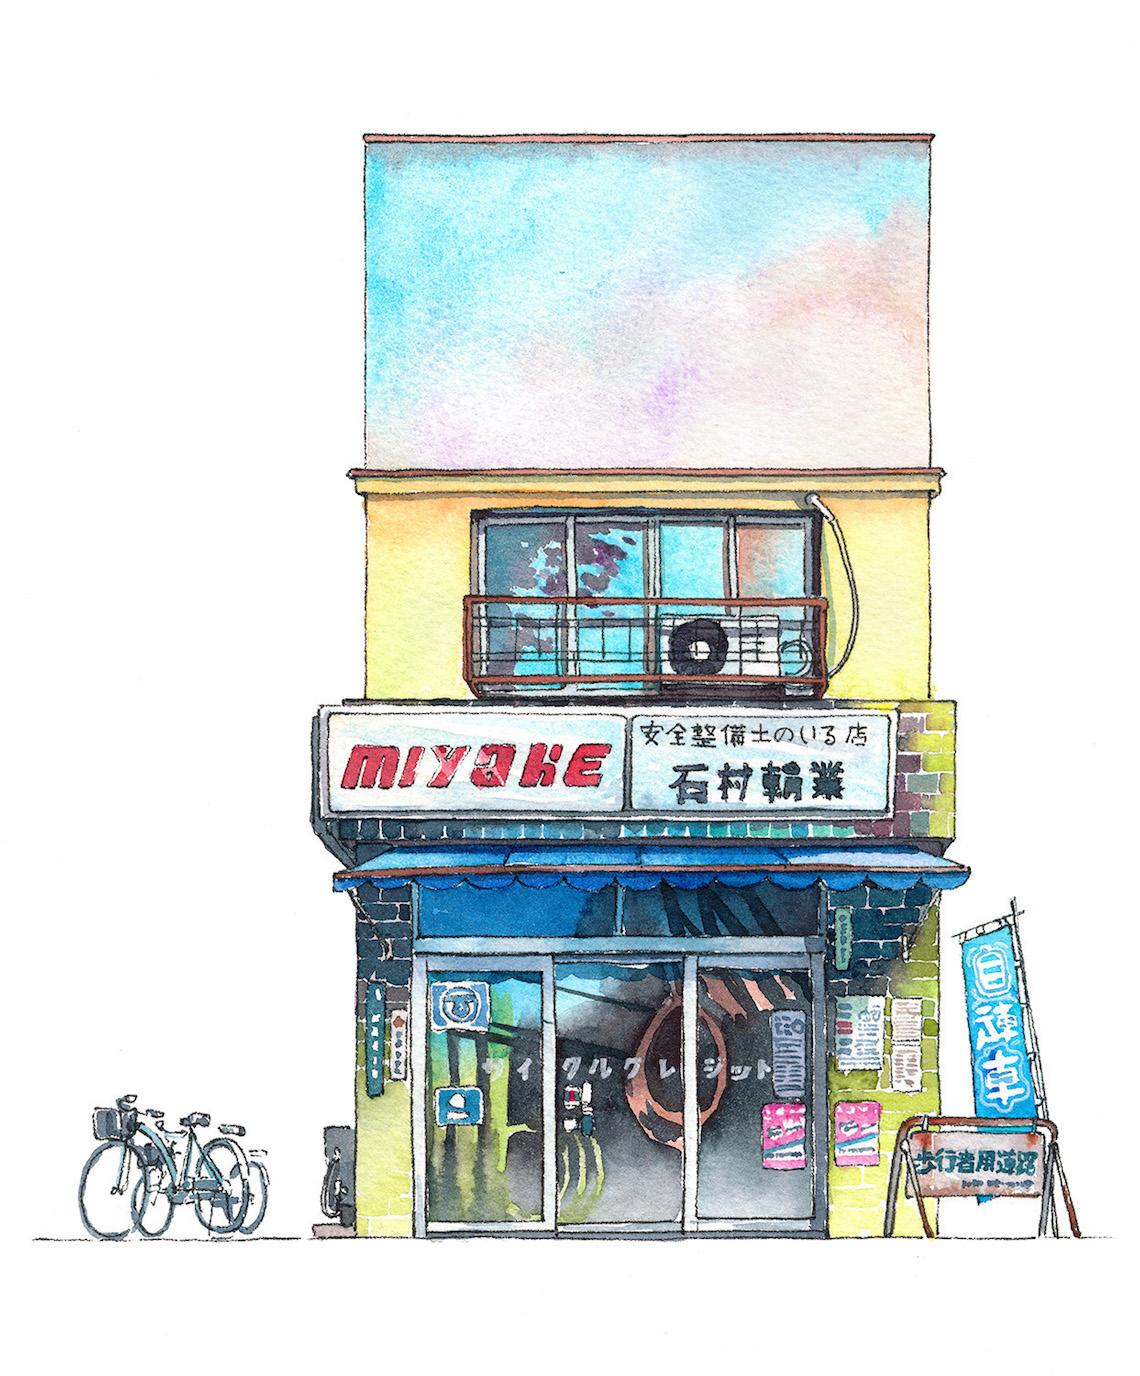 Mateusz Urbanowicz Tokyo storefront #05 Miyake_urbancycling_1